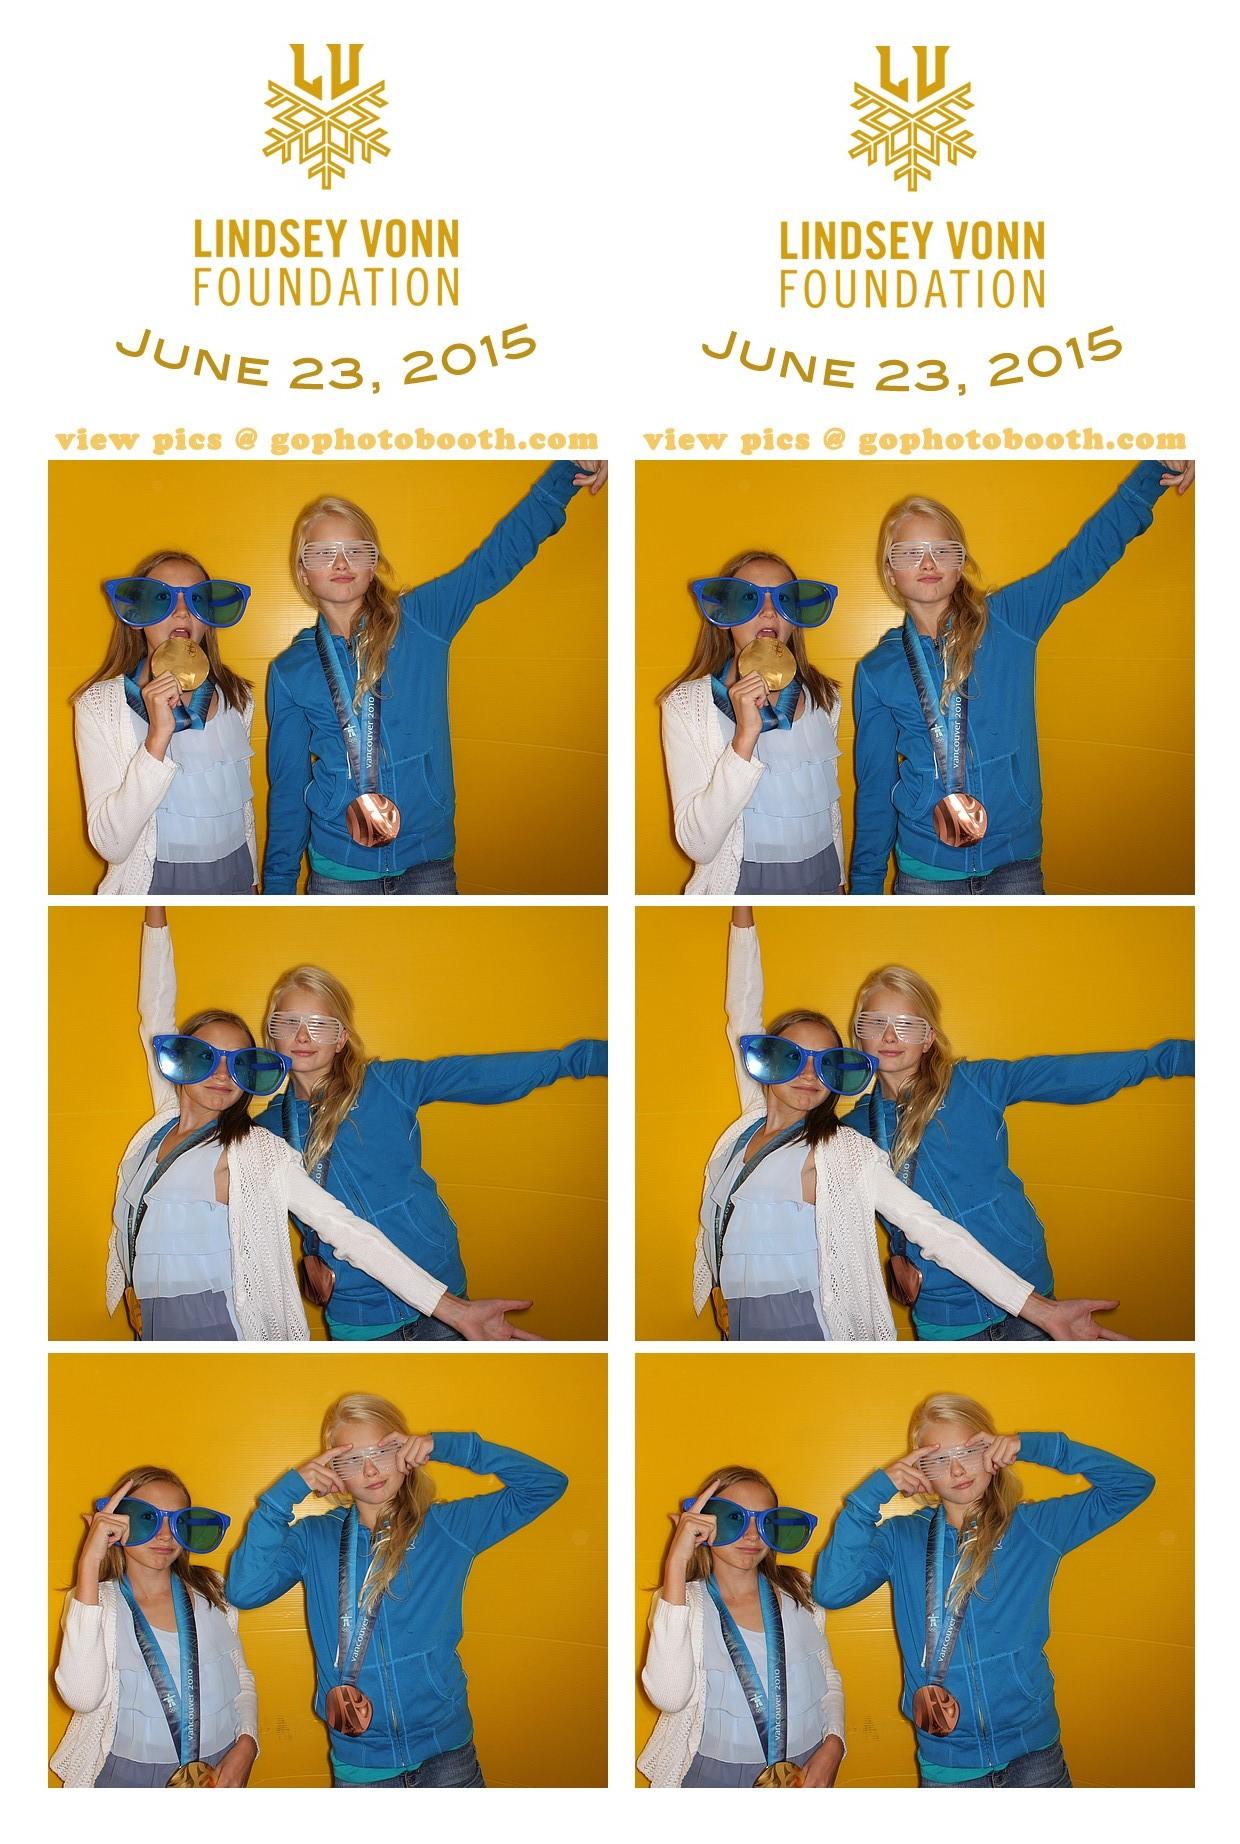 Lindsey Vonn Foundation, Vail 06/23/15